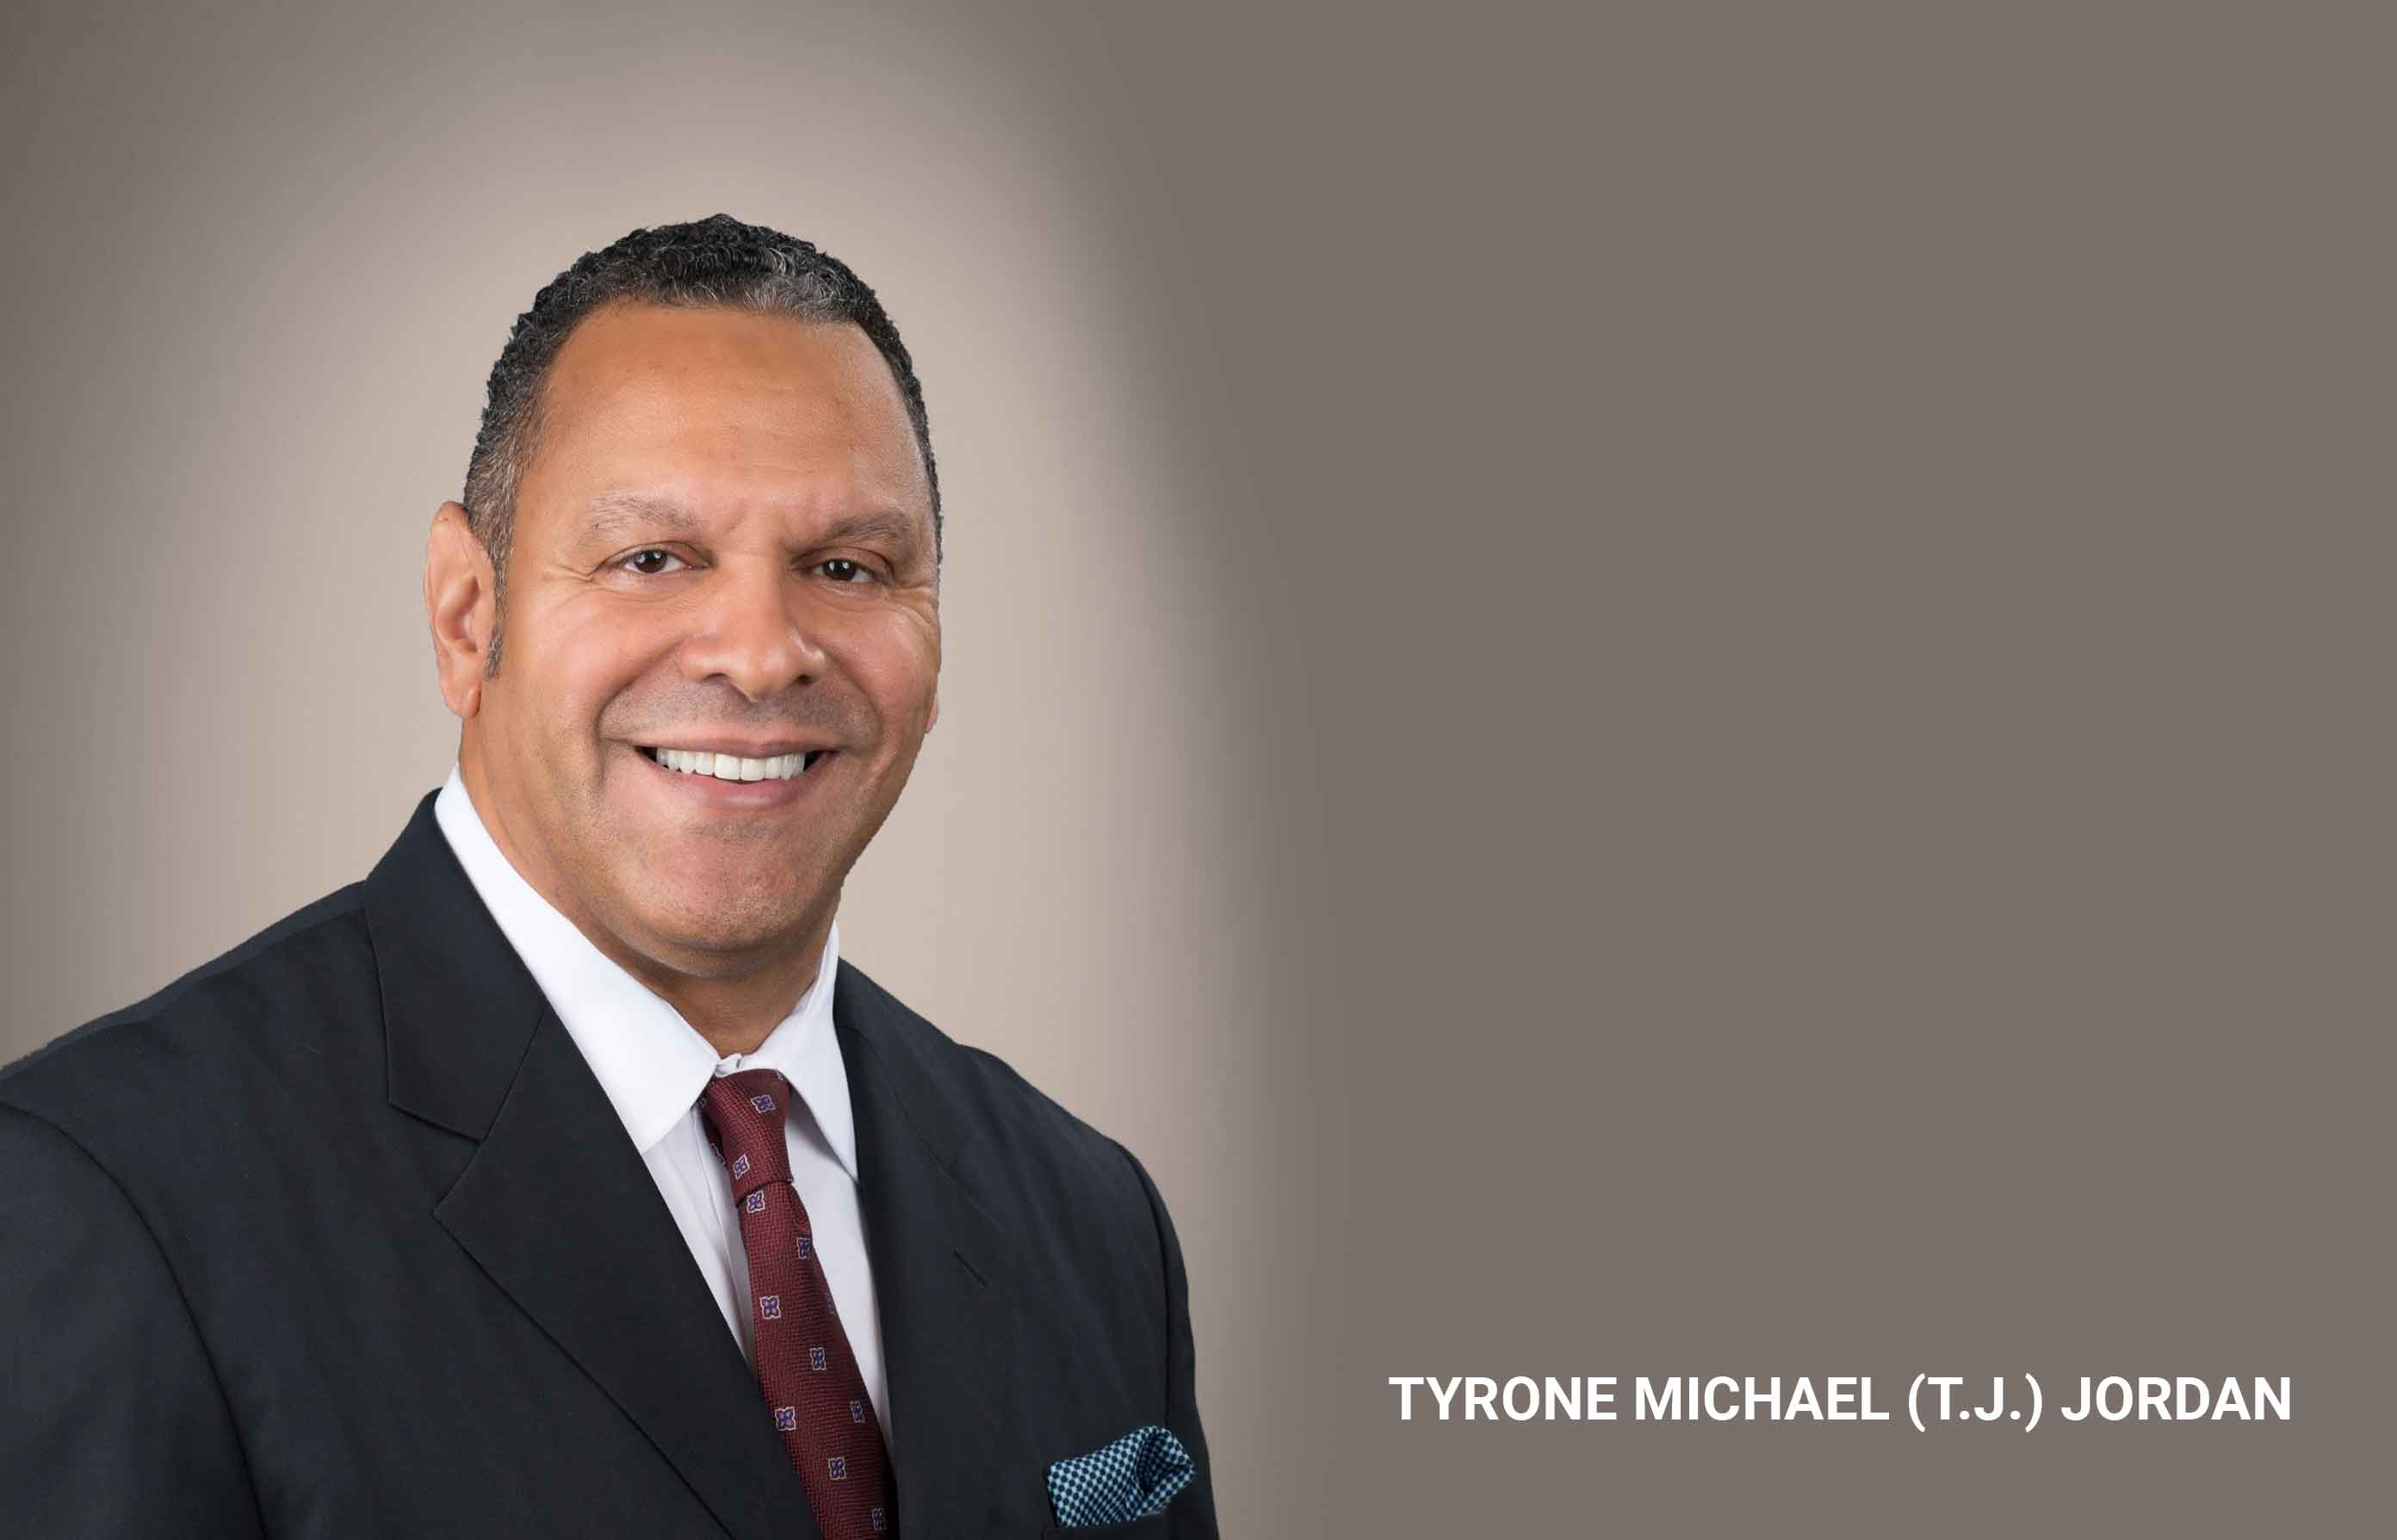 Tyrone Michael (T.J.) Jordan Named to Cooper Tire Board of Directors